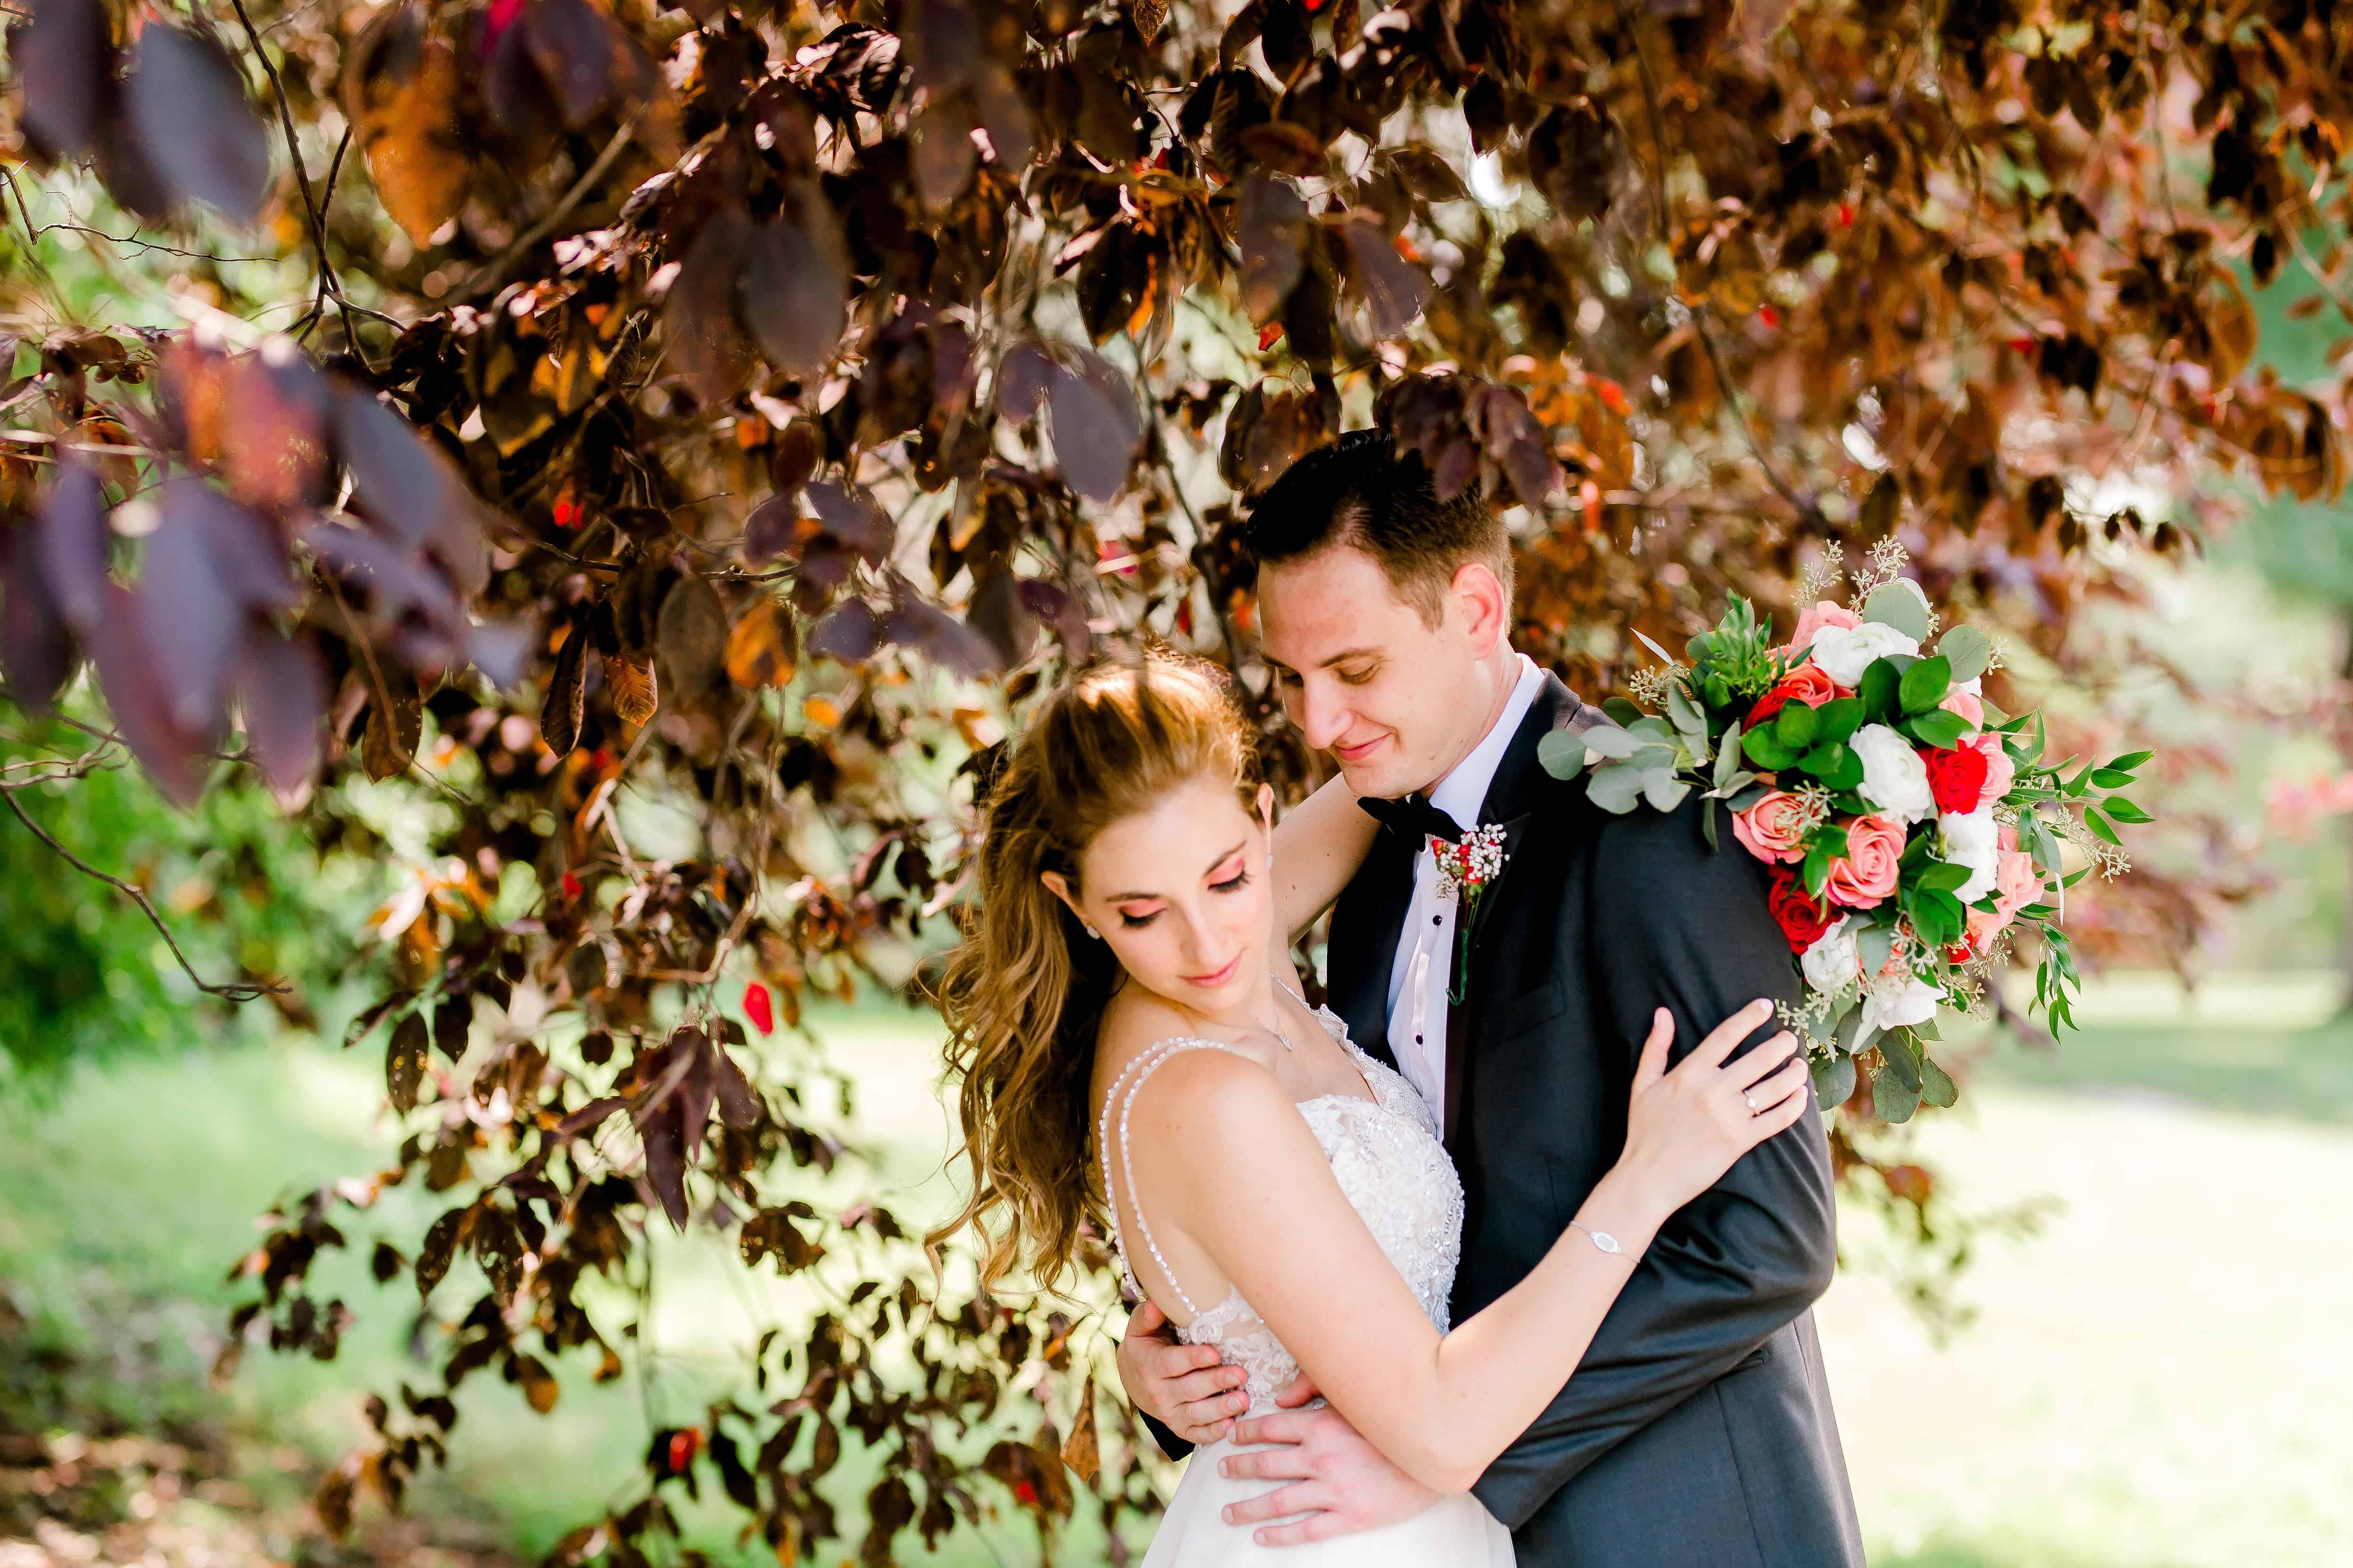 Ravenswood events center wedding bride and groom